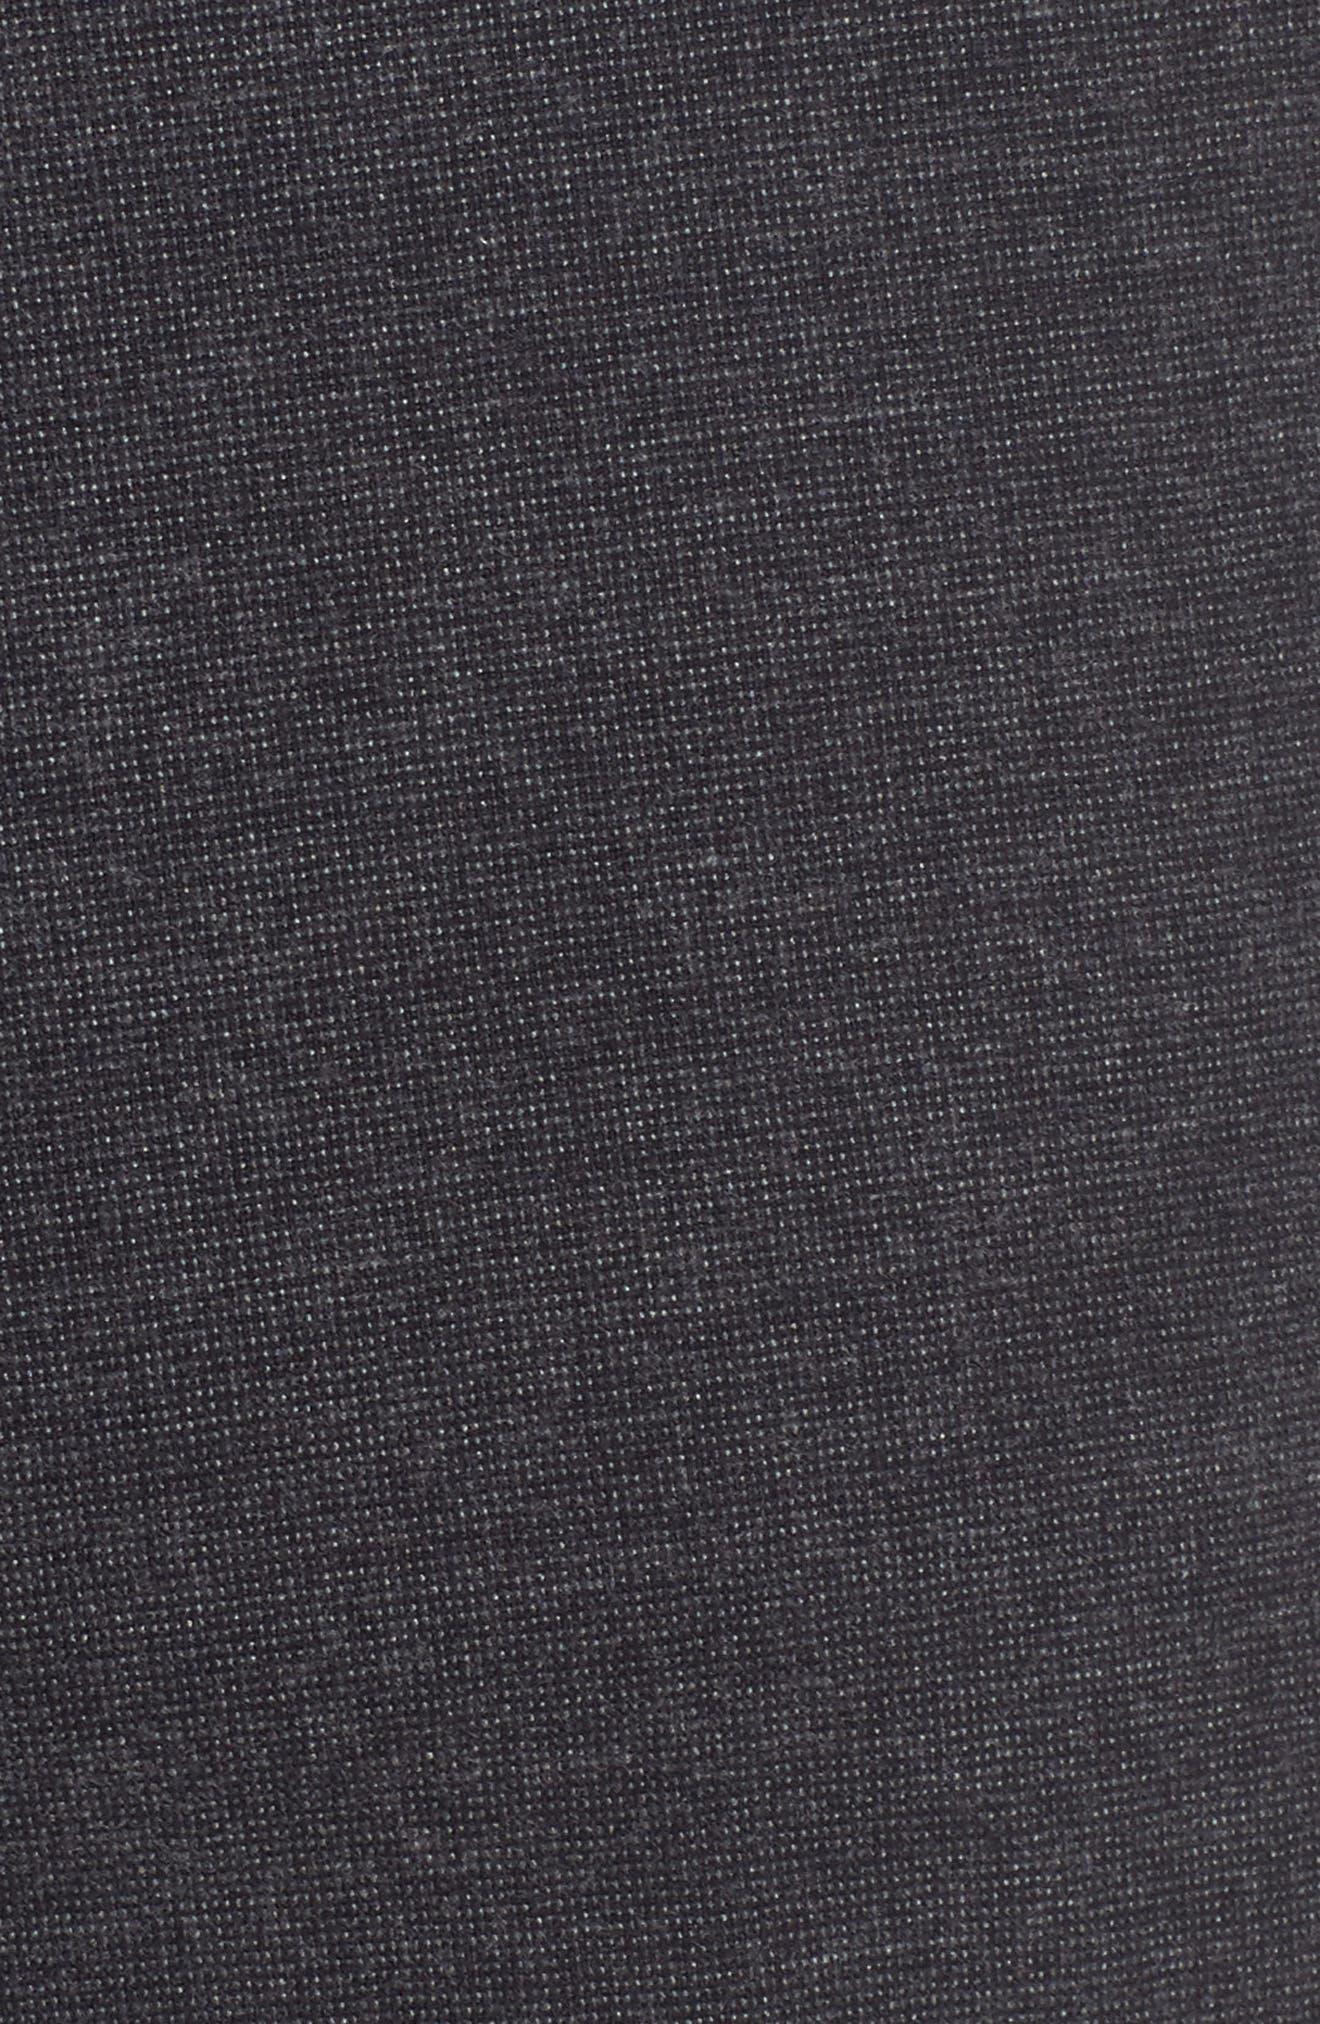 Alternate Image 5  - Bonobos Foundation Slim Fit Trousers